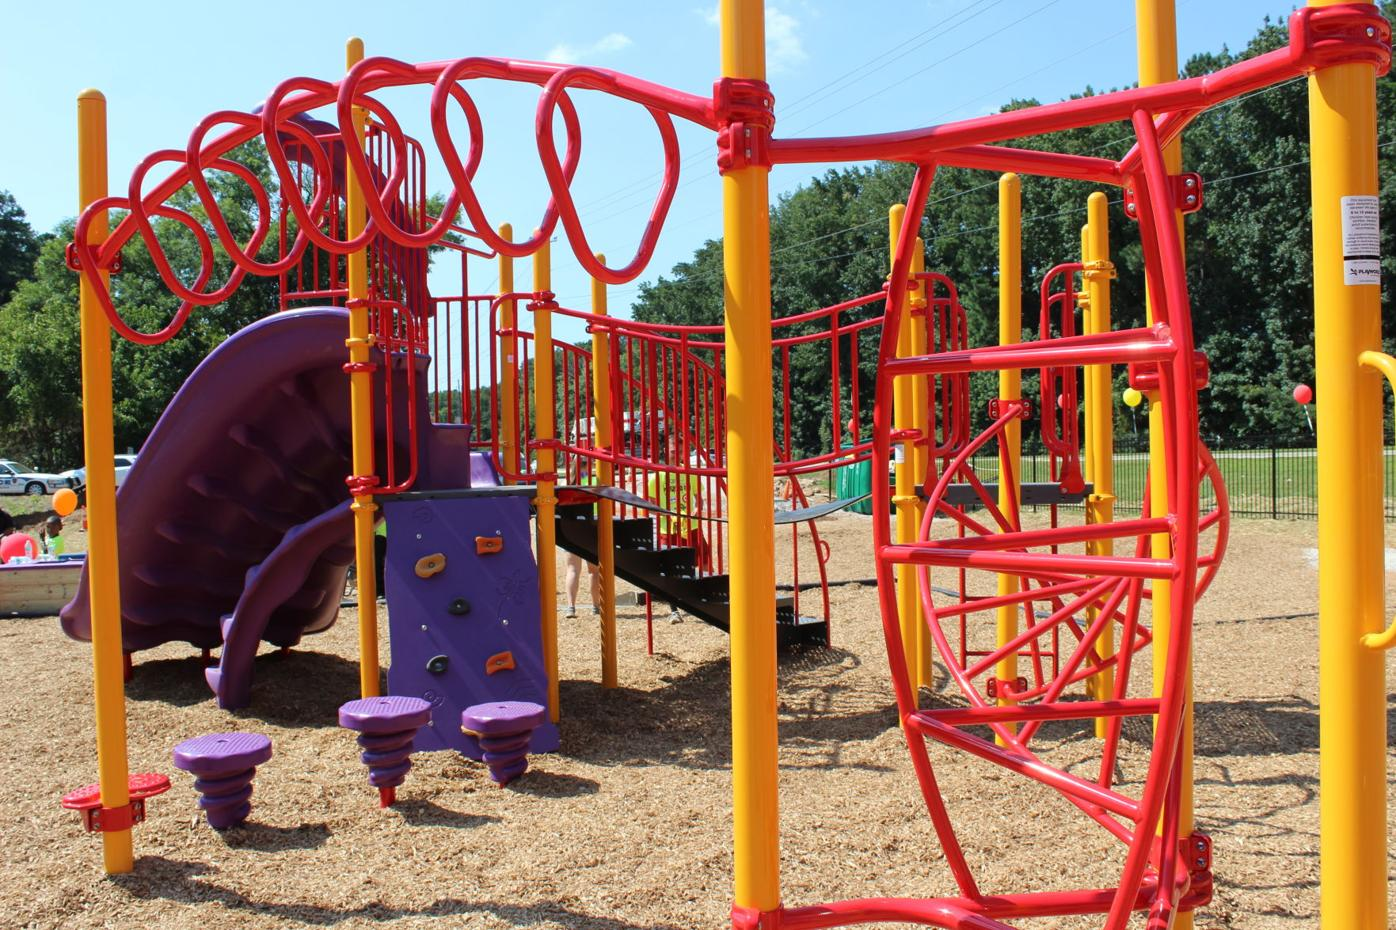 Kaboom Playground Parks And Recreation - MenalMeida